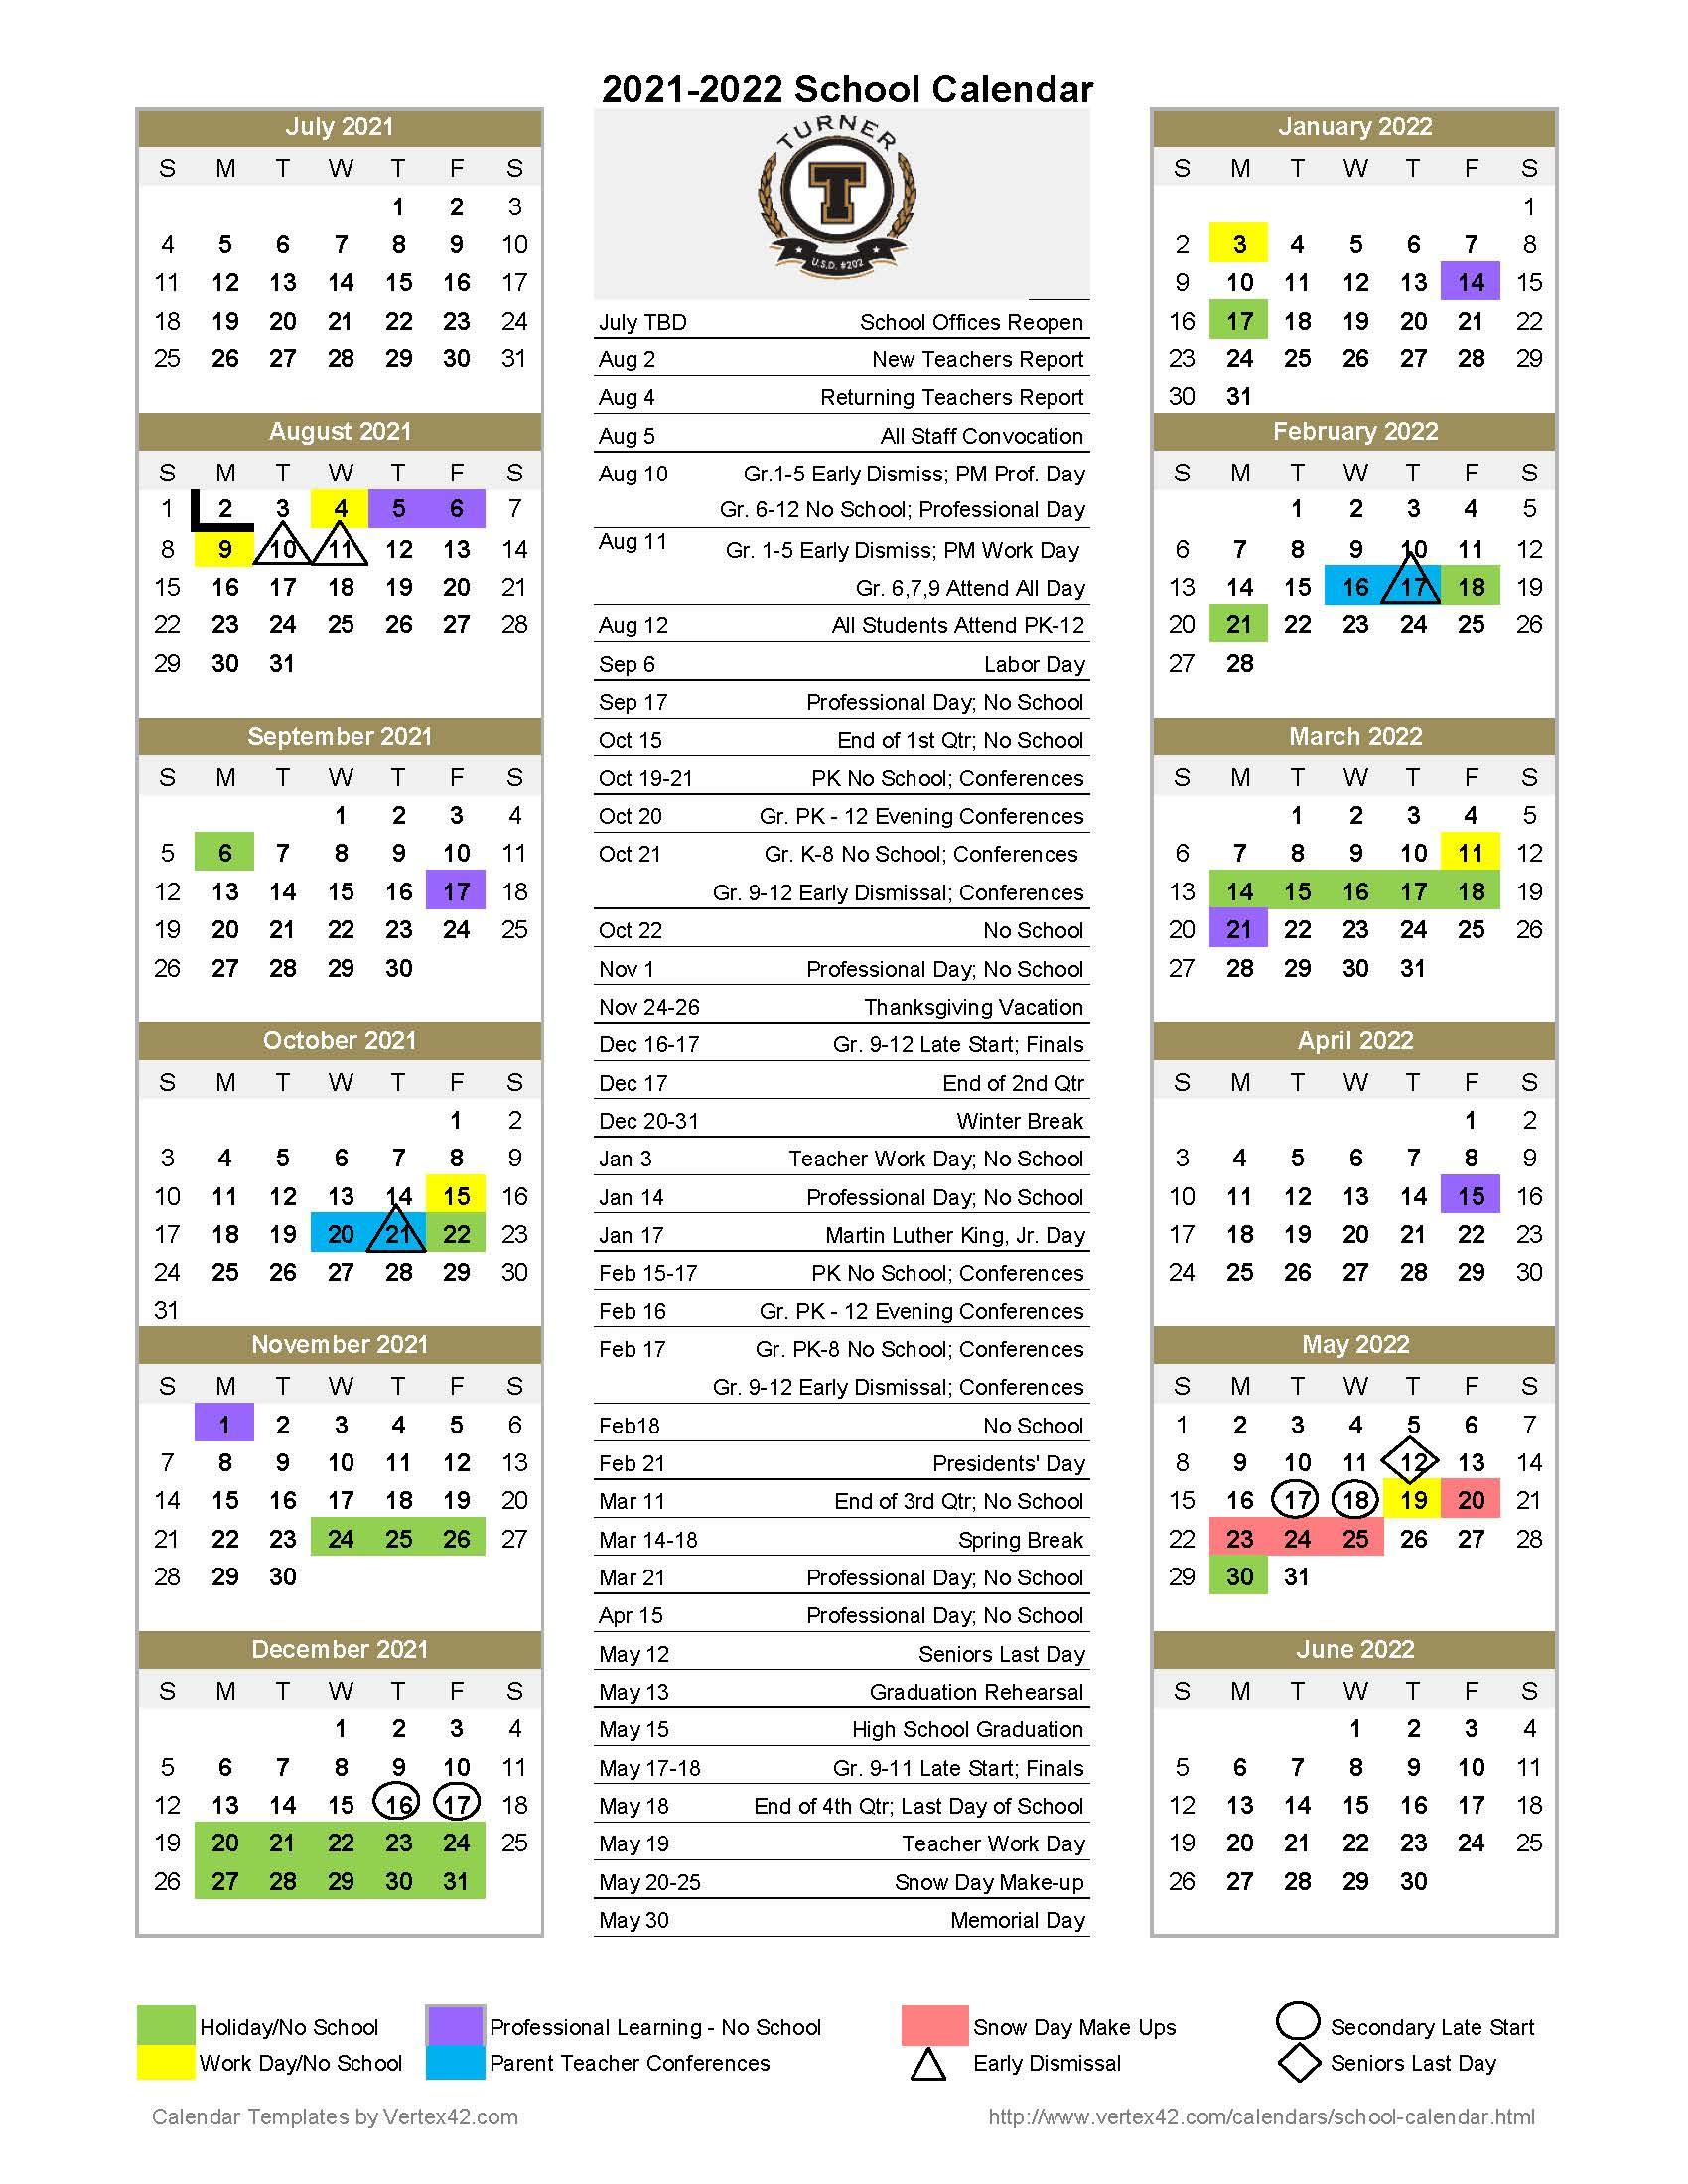 Tusd Calendar 2022.Turner Usd 202